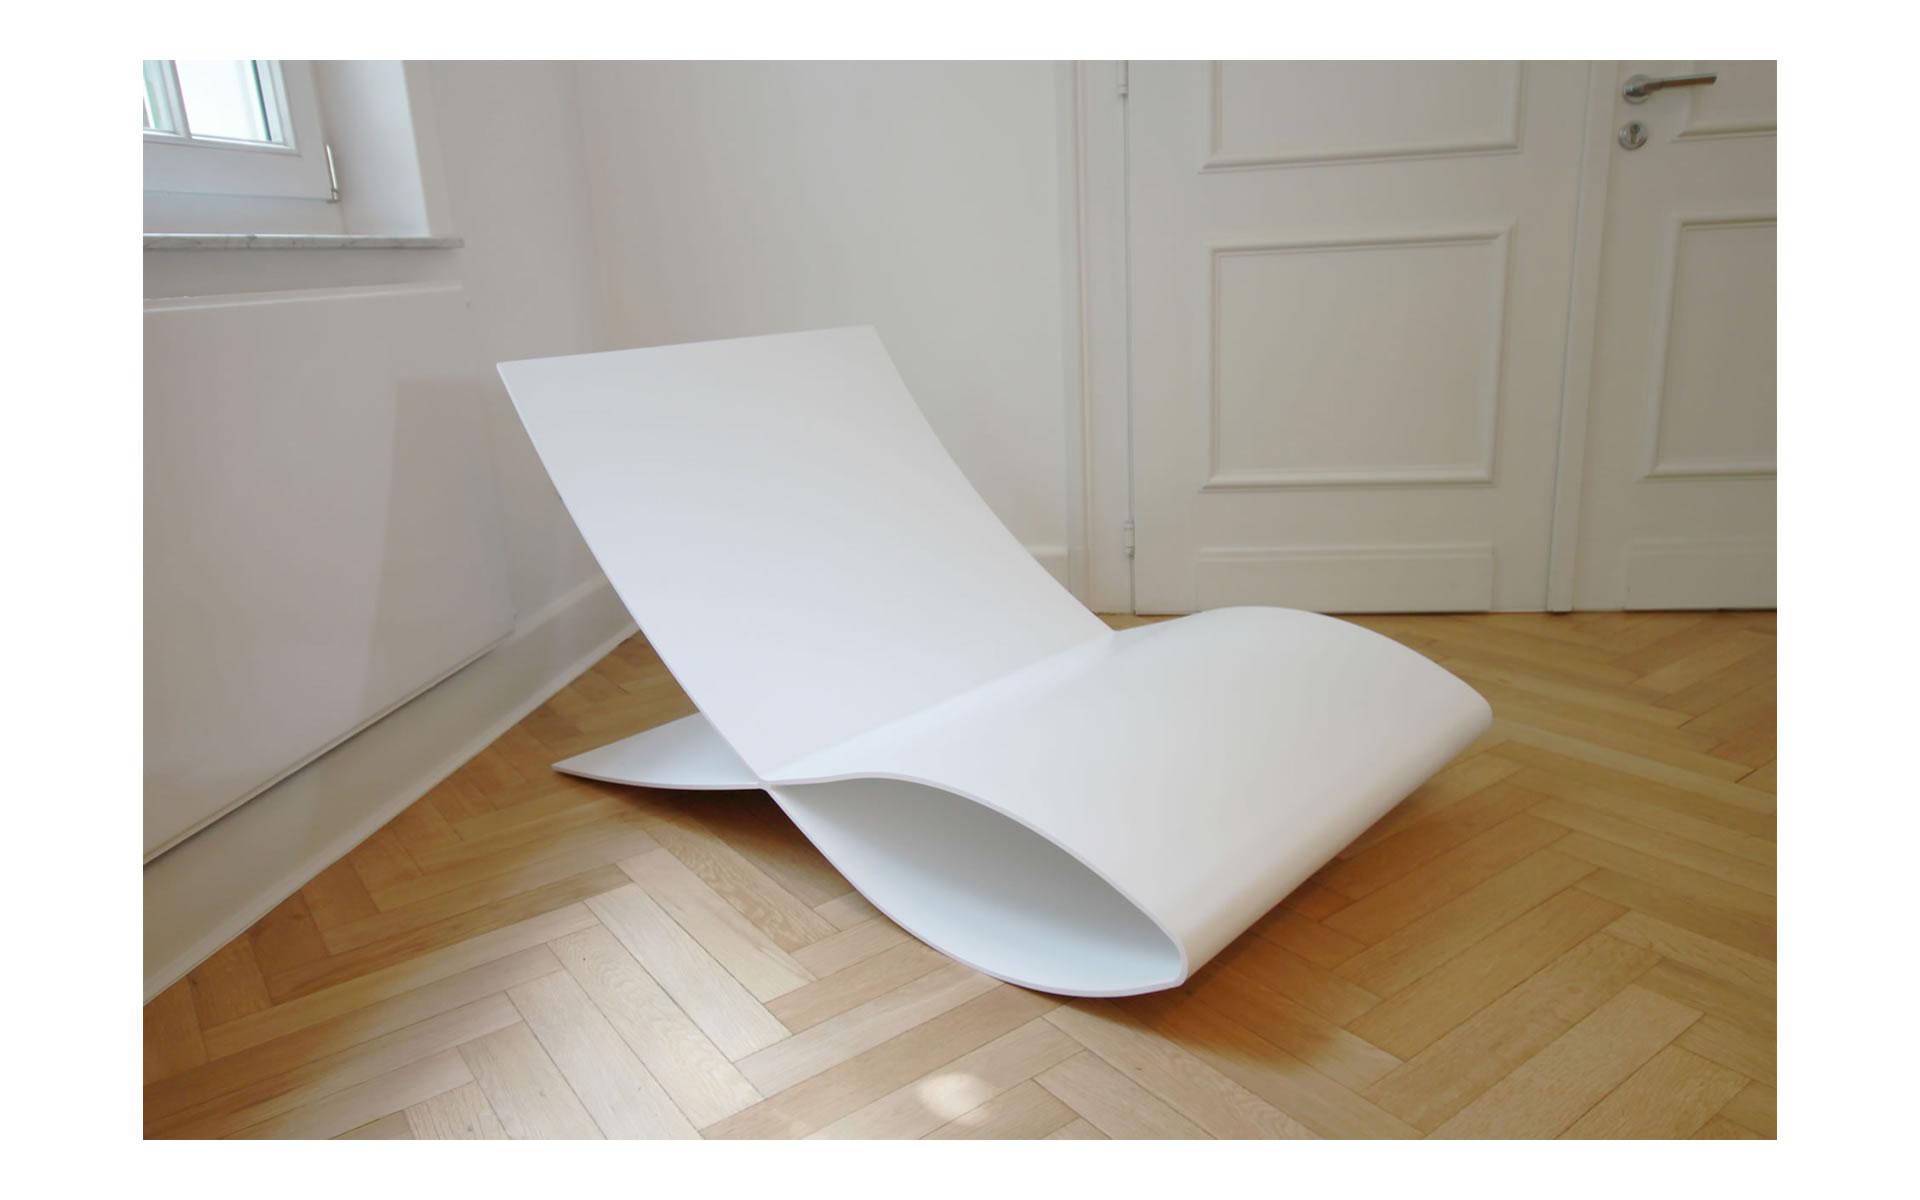 lounge sessel modern cool fly lounge sessel stuhlfabrik schnieder ldinghausen avec sessel. Black Bedroom Furniture Sets. Home Design Ideas